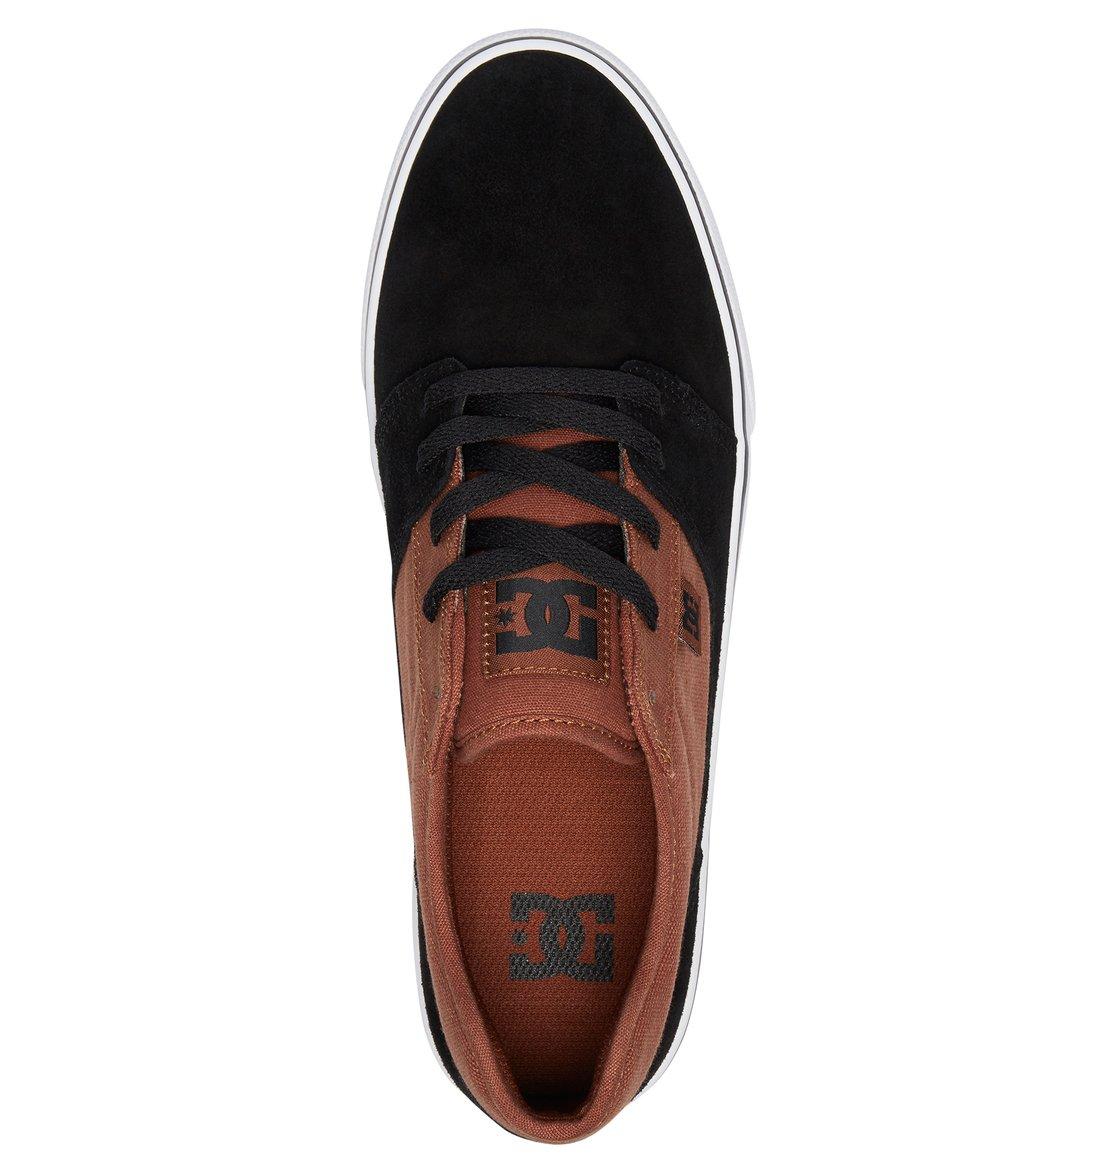 DC-Shoes-Tonik-Zapatos-para-Hombre-302905